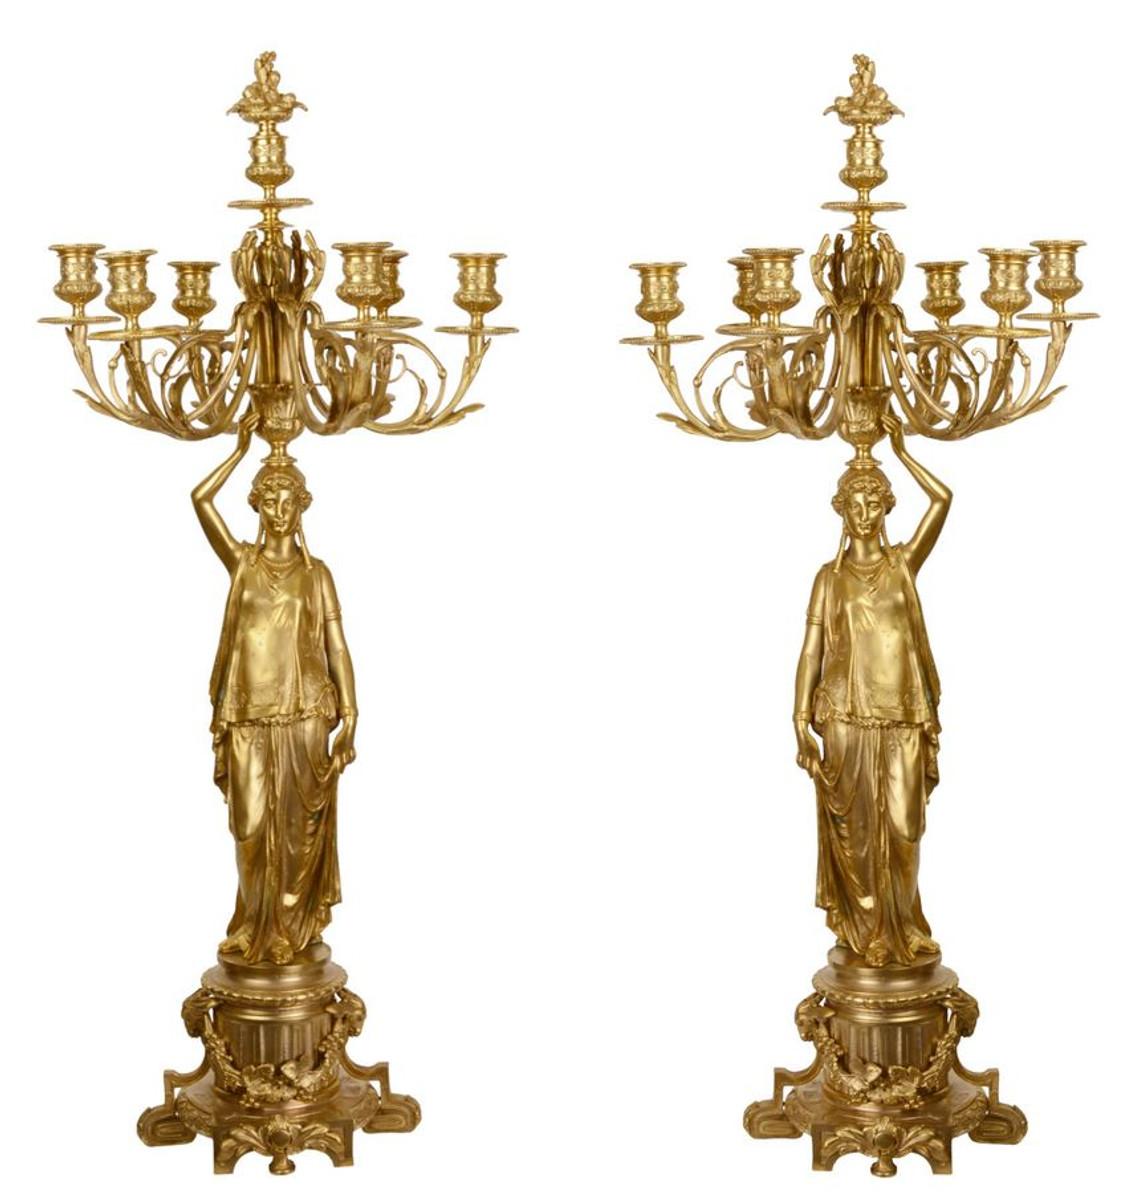 Casa Padrino Barock Kerzenständer Set Gold 37,5 x 32,5 x H. 86 cm - Edel & Prunkvoll 1